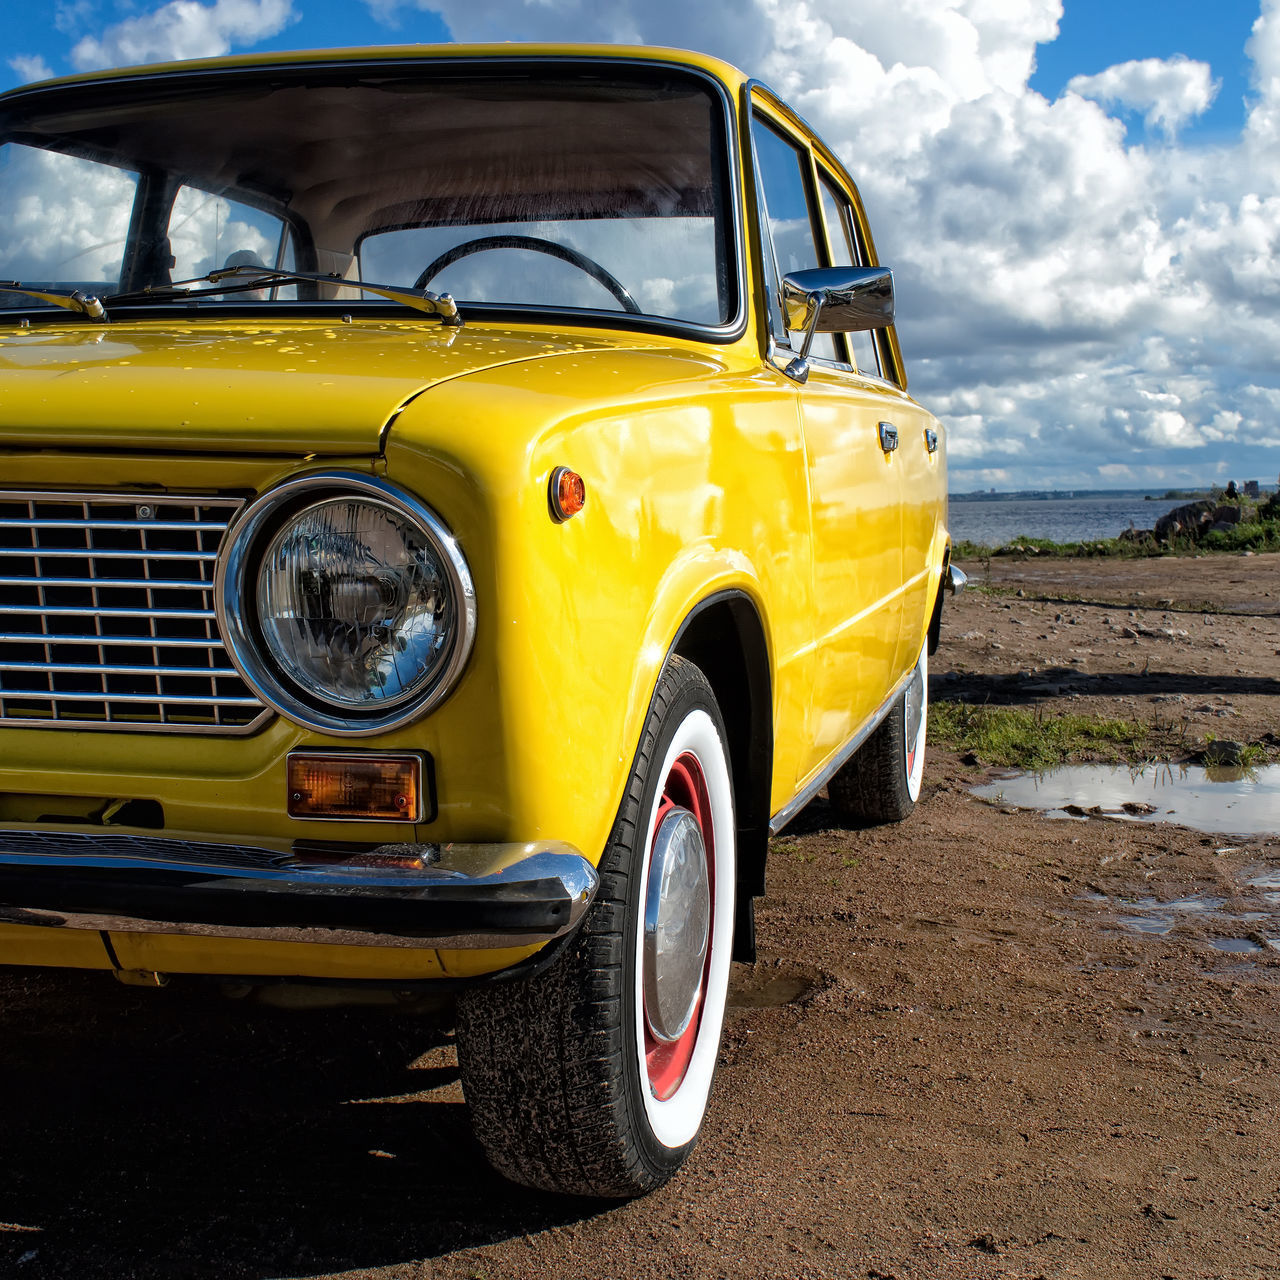 Yellow Car Against Sky